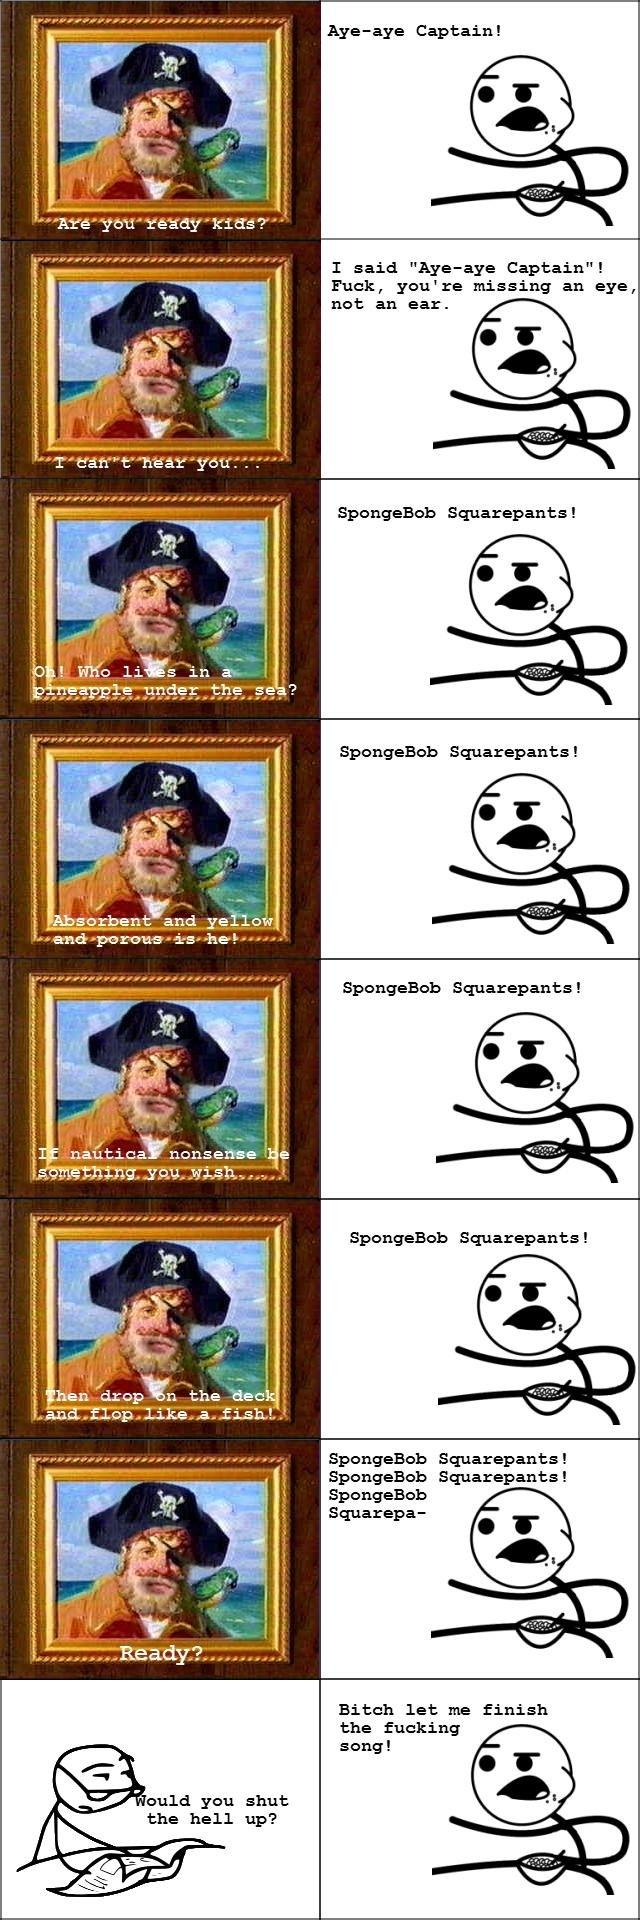 "spongebob. . Average Captain'. I said "" Captain""! Uuok, you' re missing an eye, not; an ear. Spongebob Squa: japanes'. Spongebod: Squarepants! Absorbent and yel"